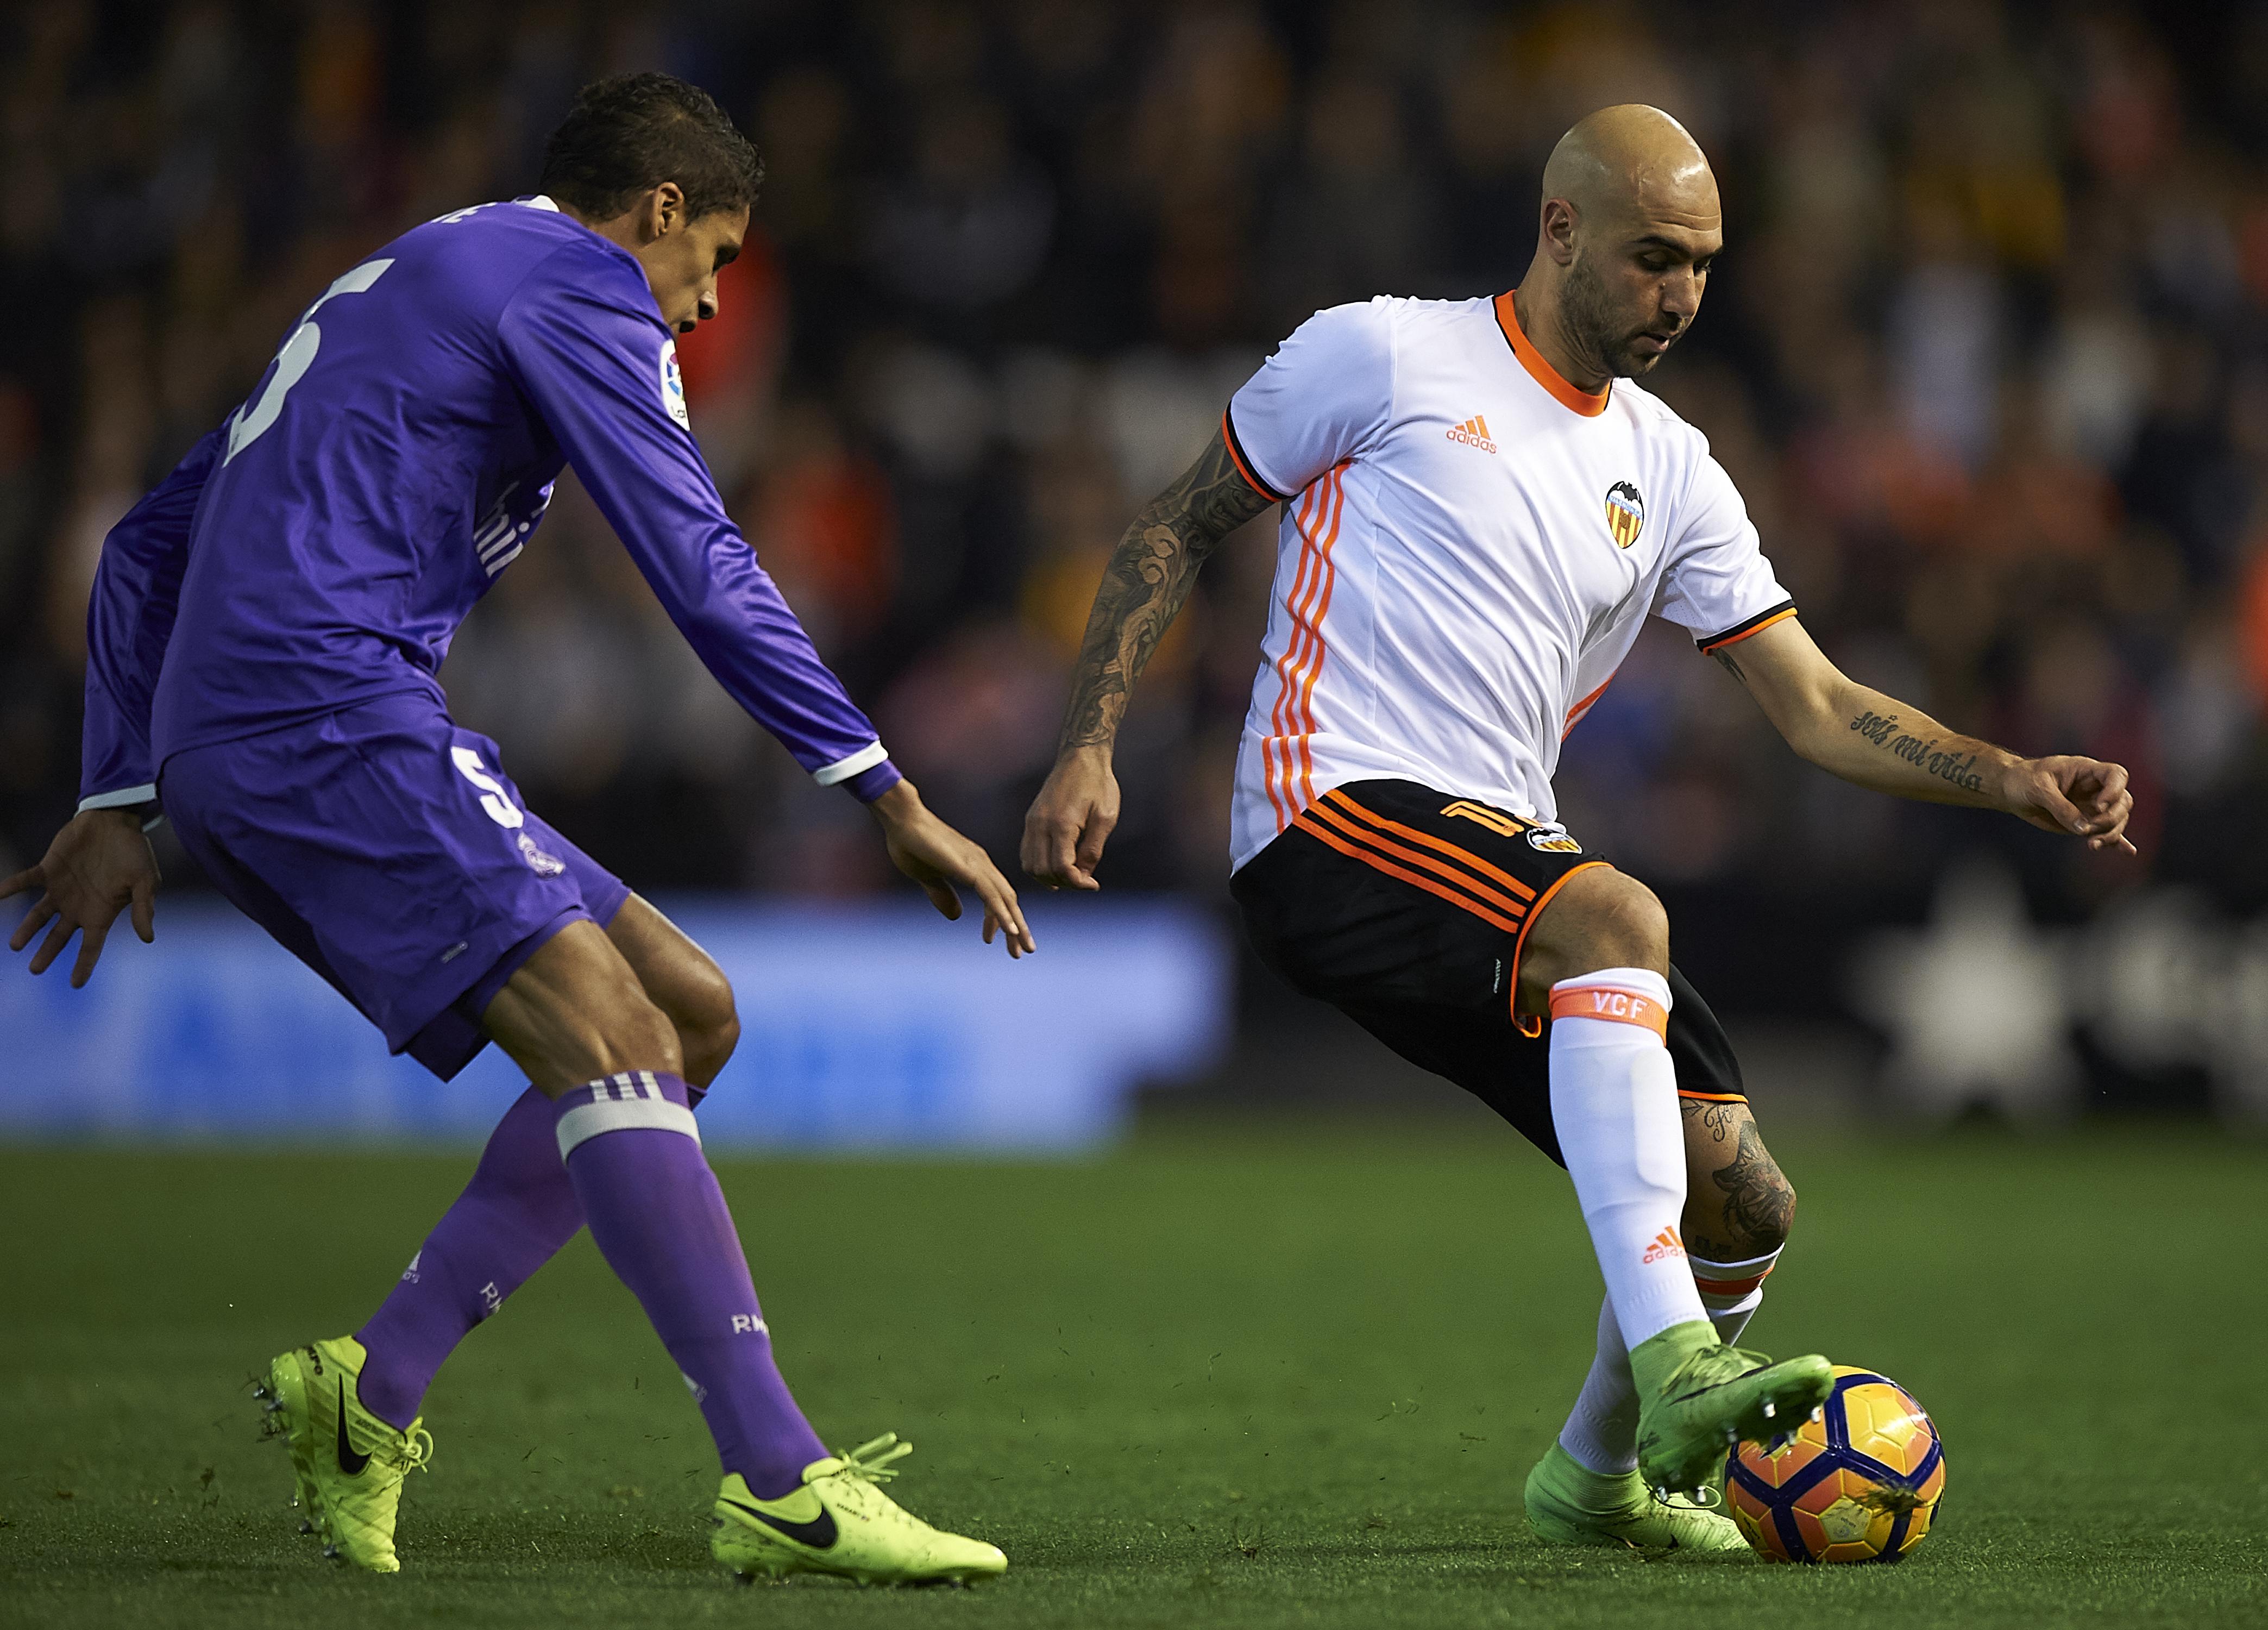 Real Madrid Raphael Varane Out 3 Weeks With Leg Injury